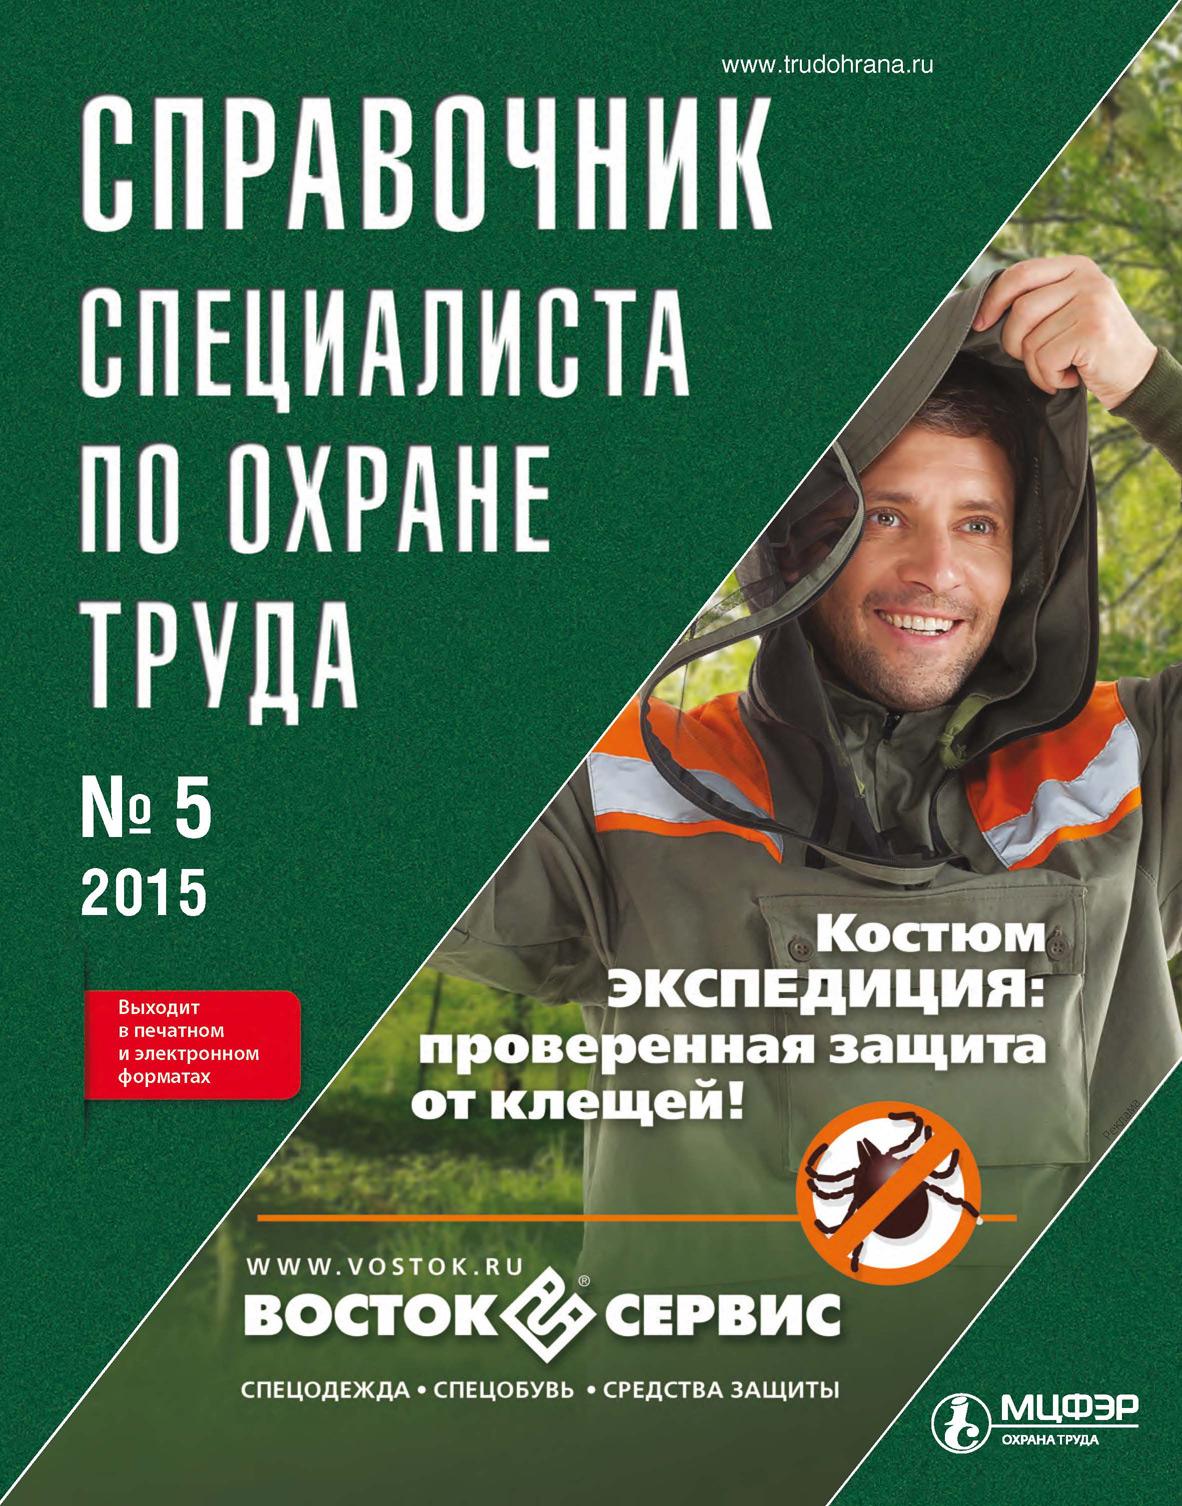 Справочник специалиста по охране труда № 5 2015